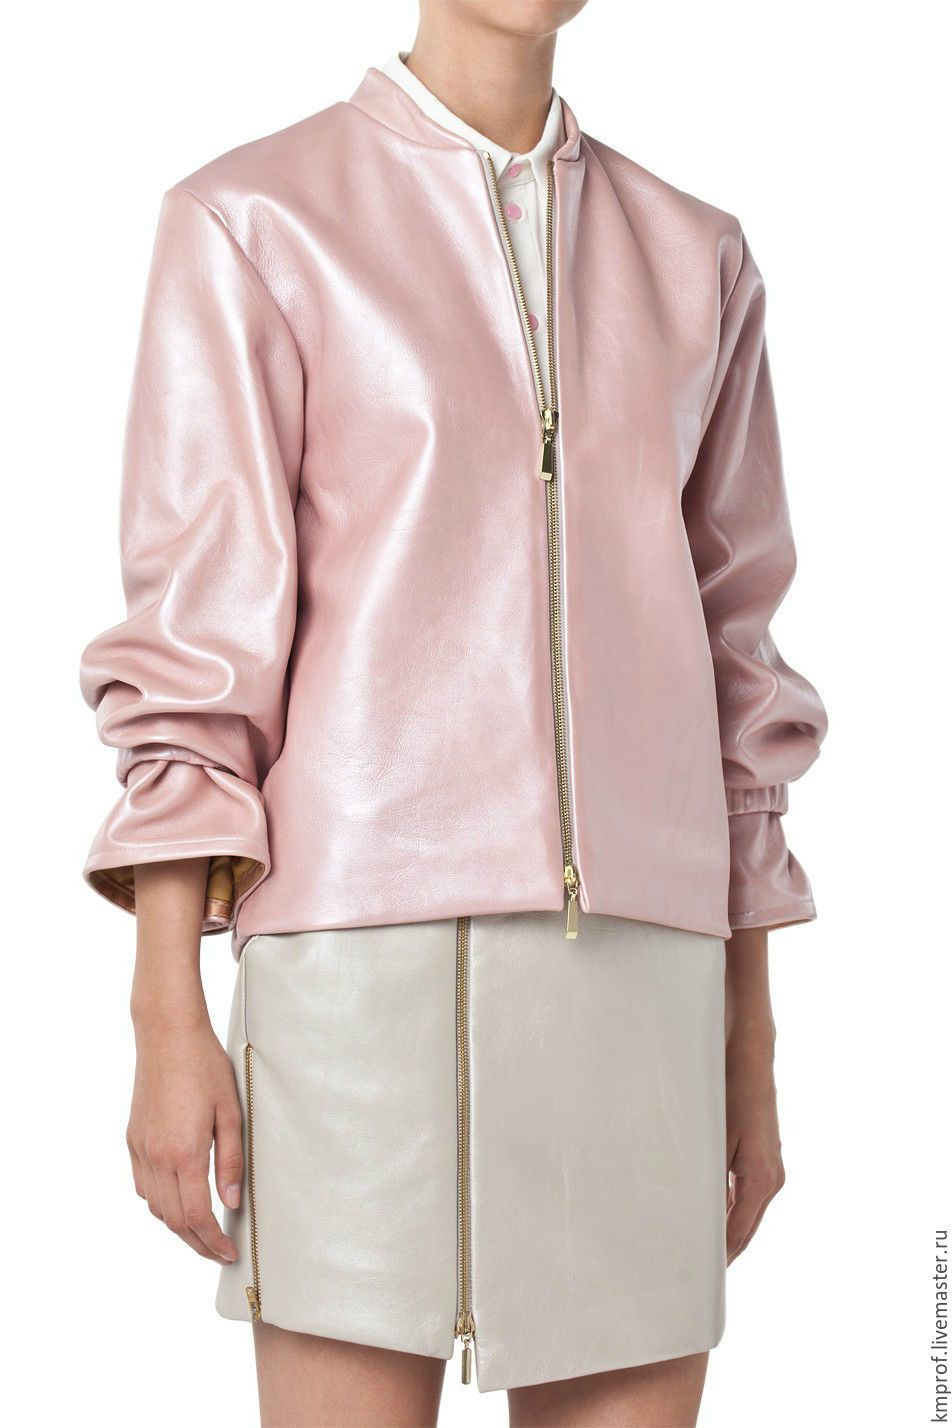 Soft pink leather jacket